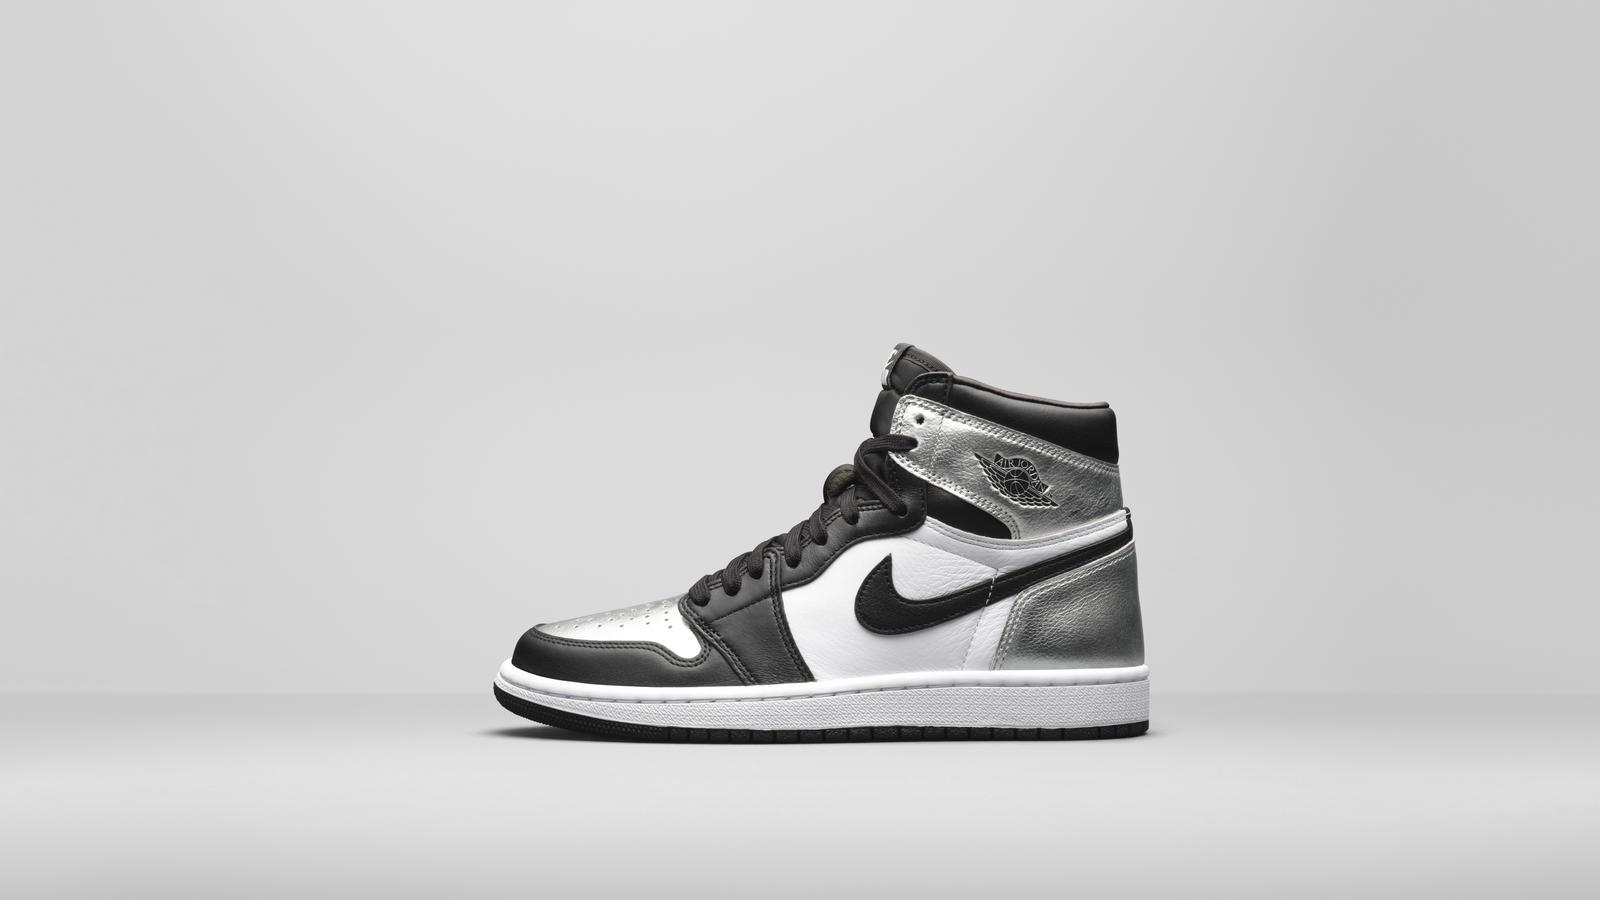 Jordan Brand Spring 2021 Retro Releases 1